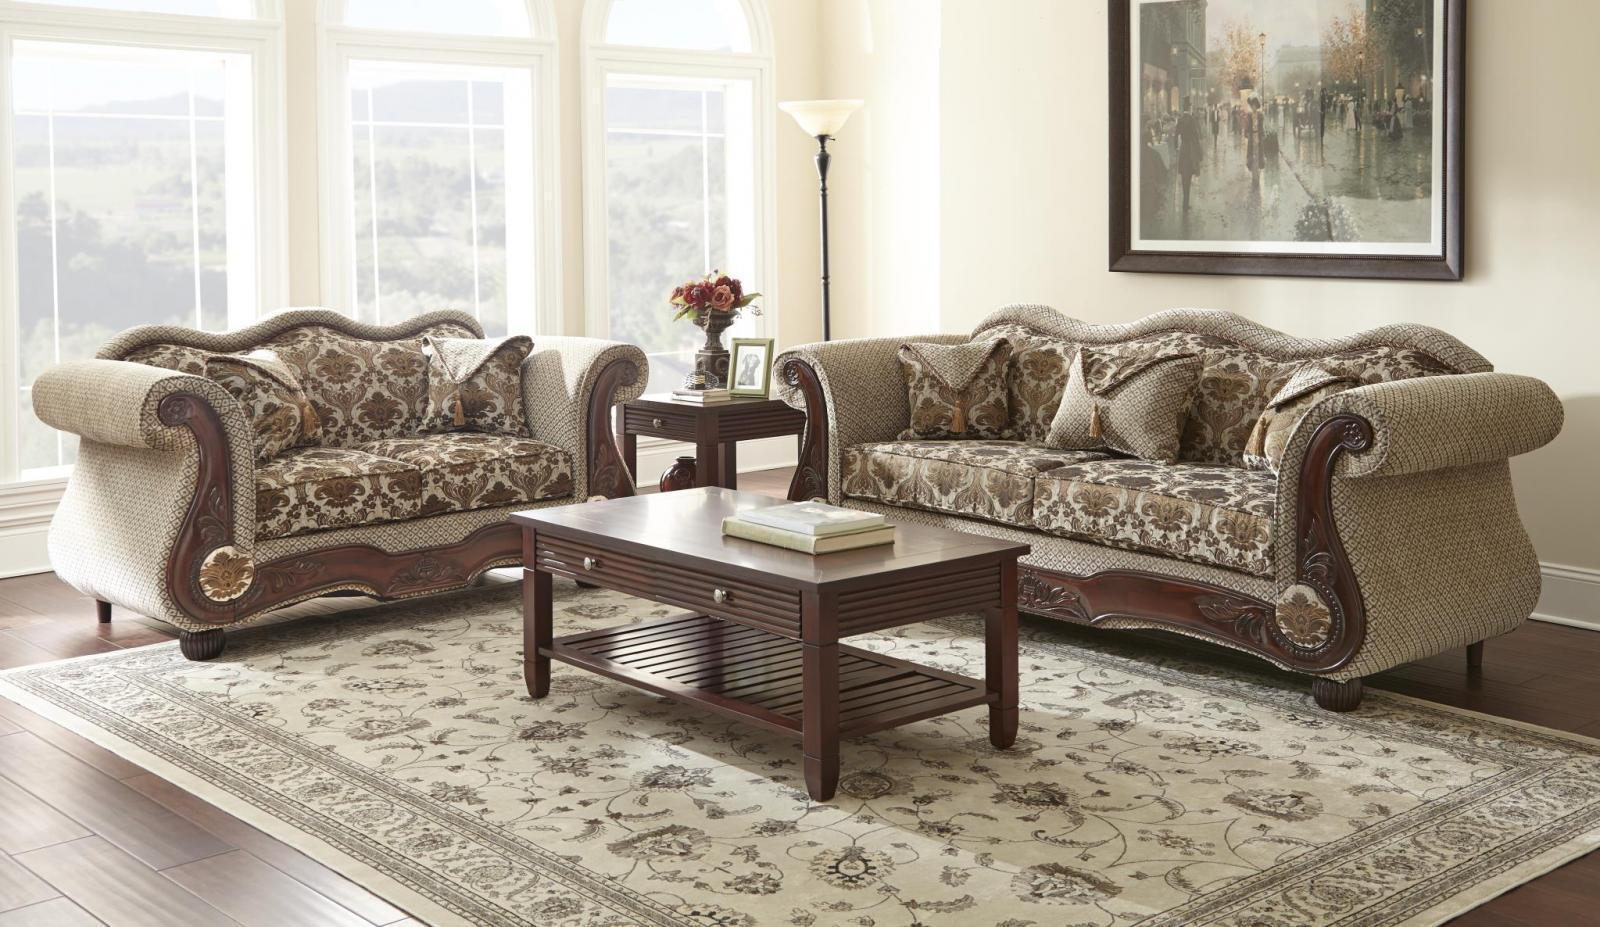 myco furniture mabelle carved wood bronze velvet fabric living room sofa sofas loveseats. Black Bedroom Furniture Sets. Home Design Ideas